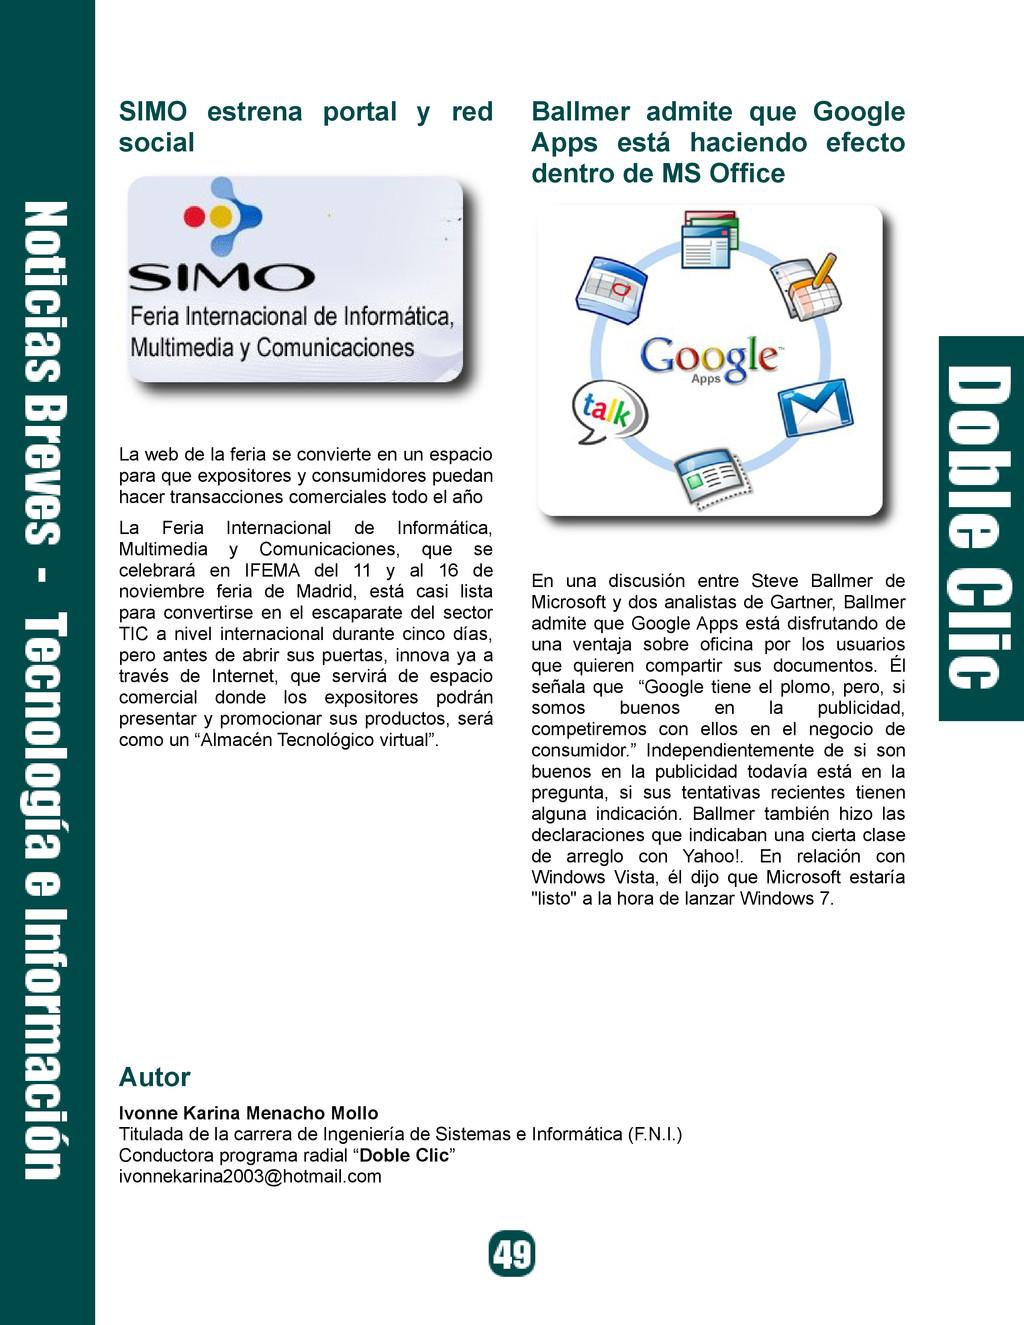 SIMO estrena portal y red social La web de la f...